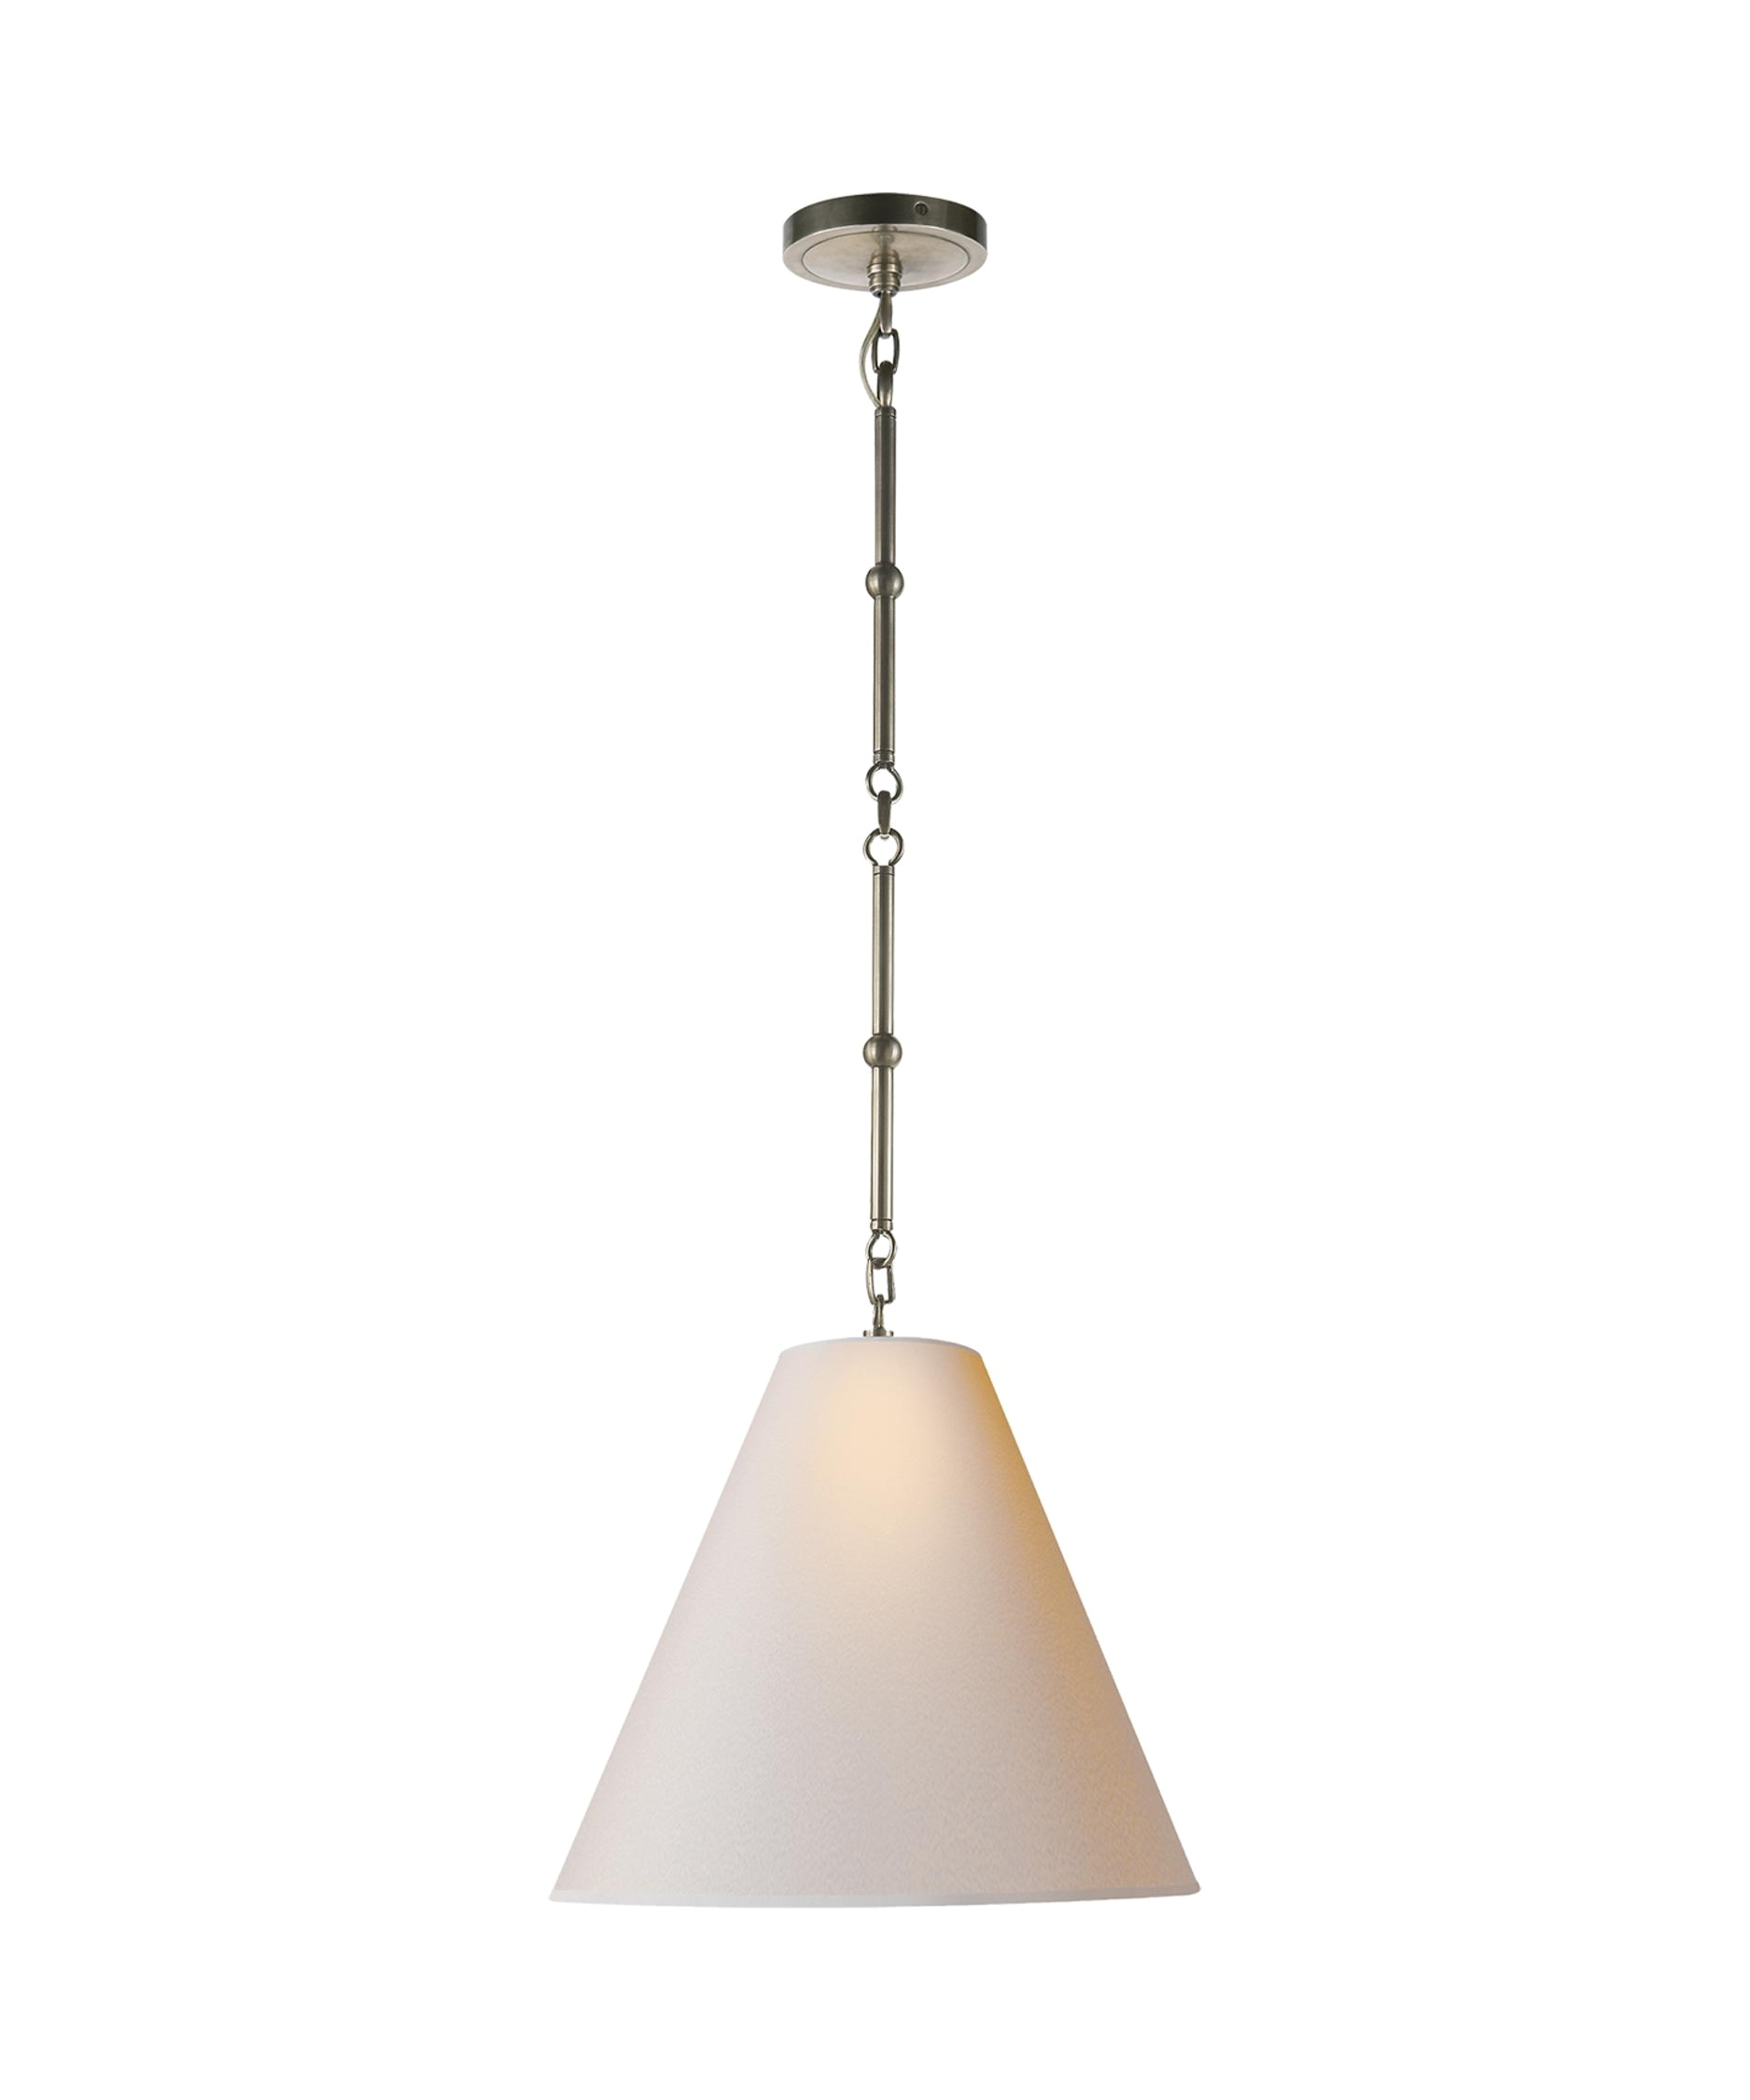 visual comfort tob5090 thomas obrien goodman 15 inch wide 1 light large pendant capitol lighting 1 800lighting com